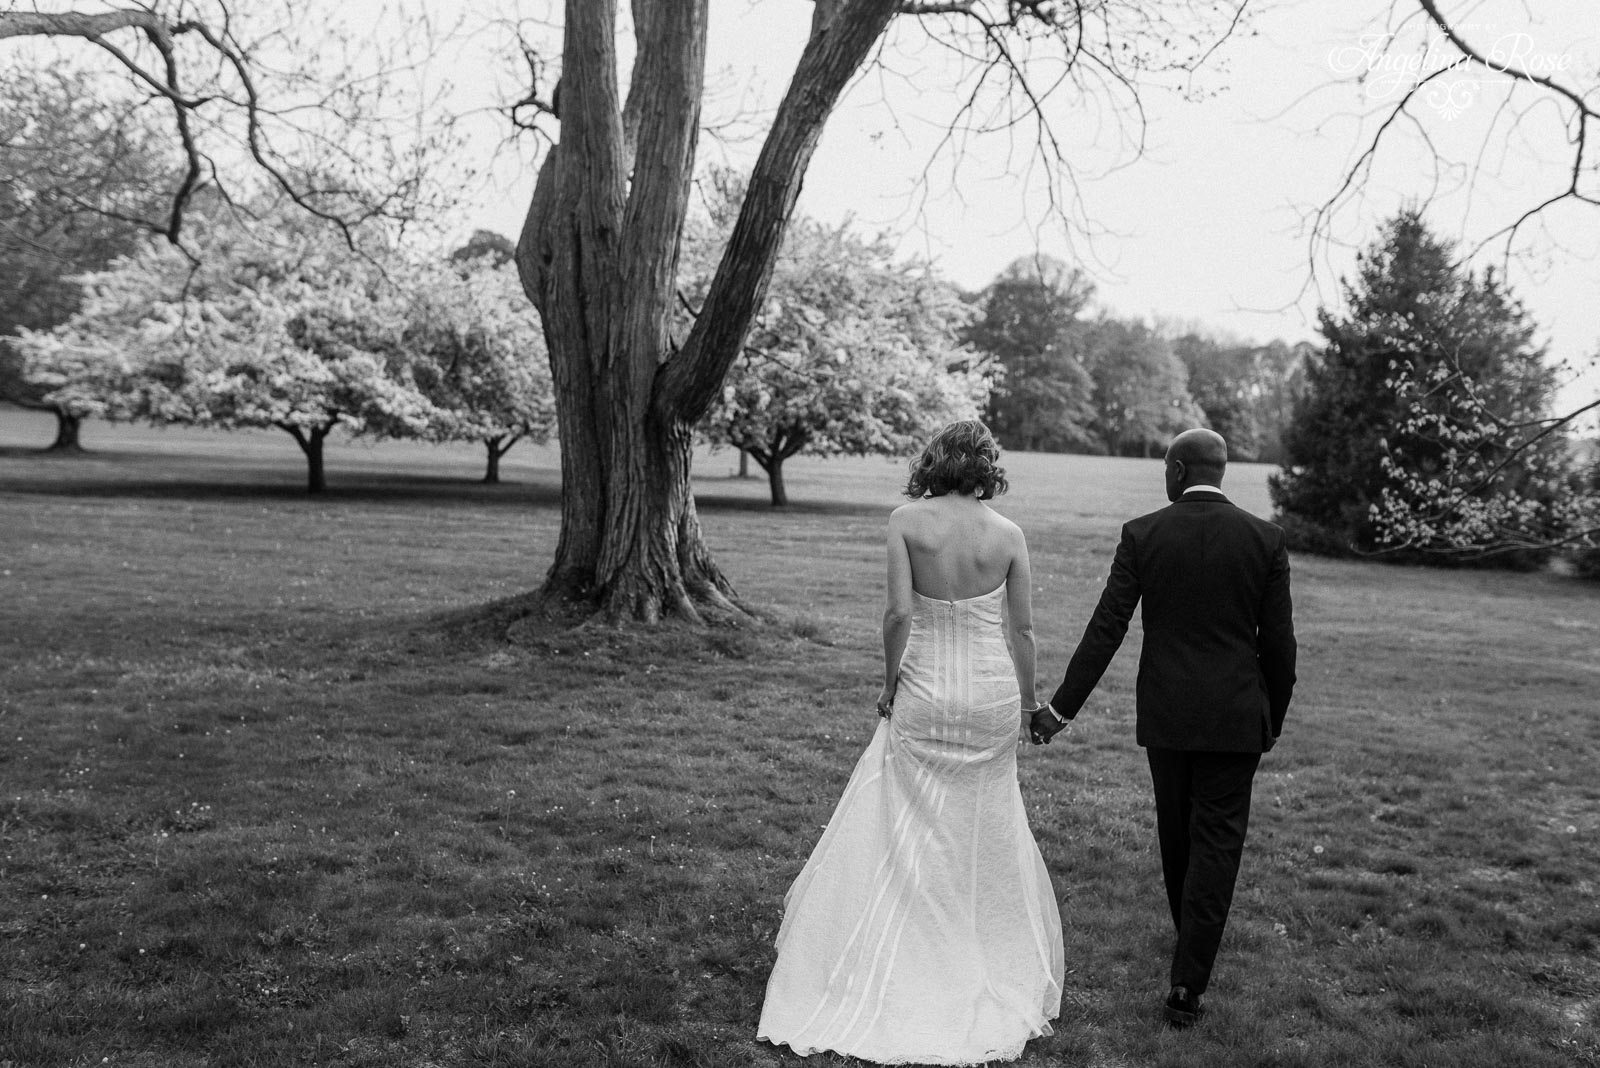 Blithewold Wedding photography Blithewold Wedding Wedding at Blithewold Bristol RI 391 Blithewold Wedding: Derick and Aislinn